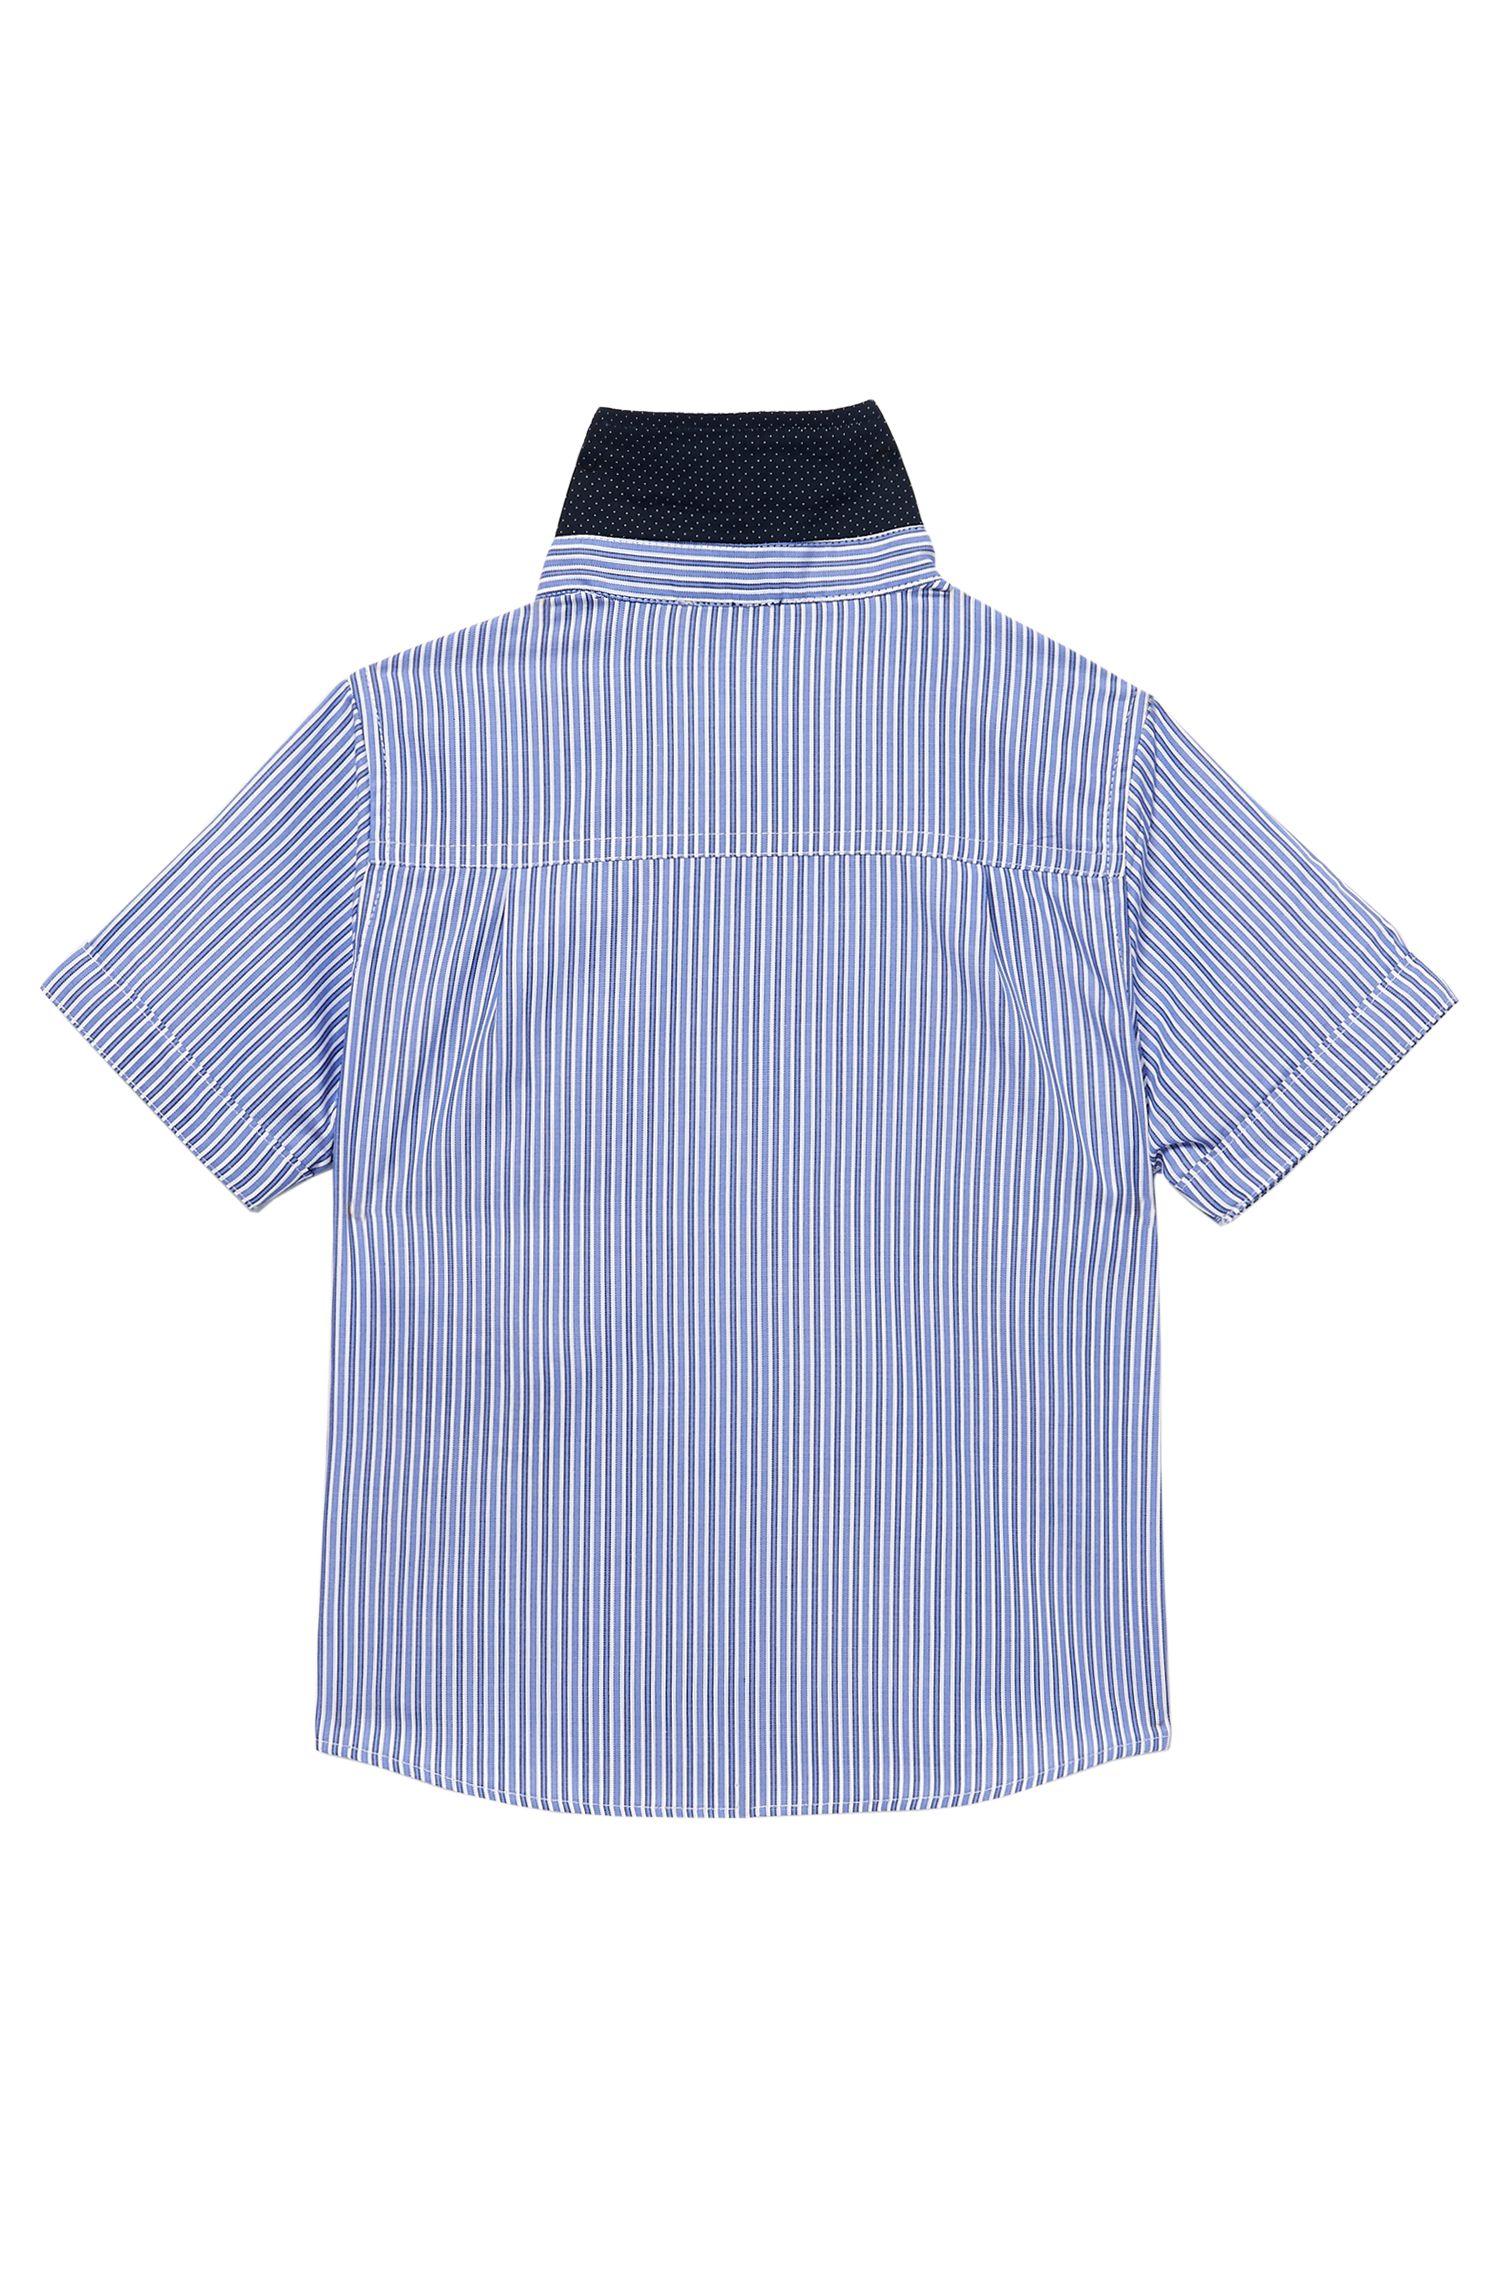 'J05291' | Toddler Cotton Short-Sleeve Stripe Shirt